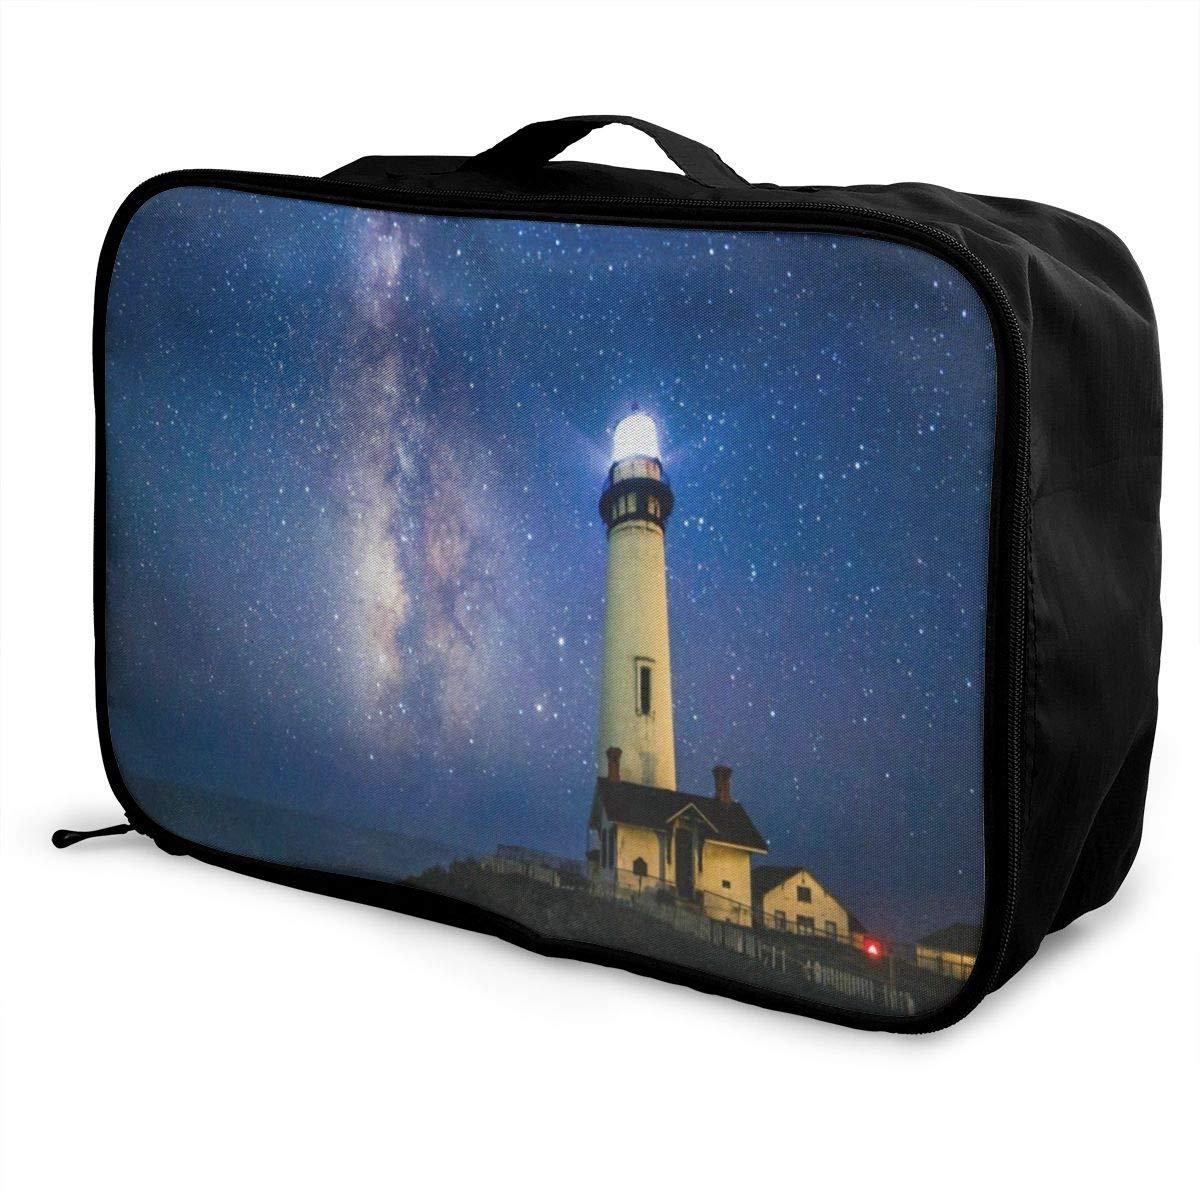 Luggage Bag Travel Duffel Bag Waterproof Starry Night Lighthouse Lightweight Large Capacity Portable Storage Bag